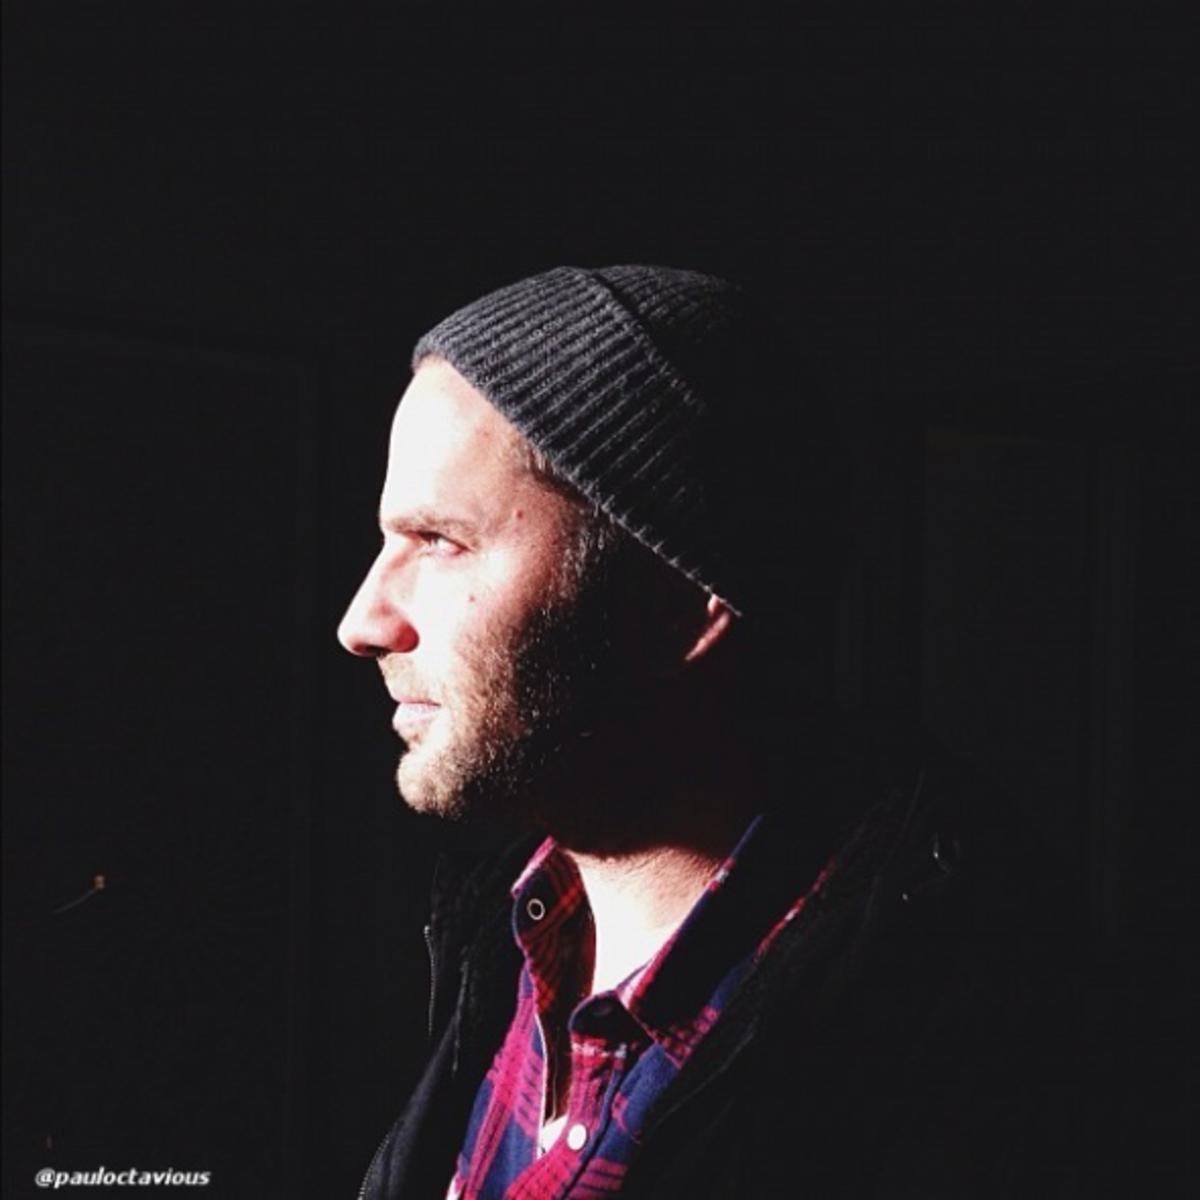 paul octavious on instagram